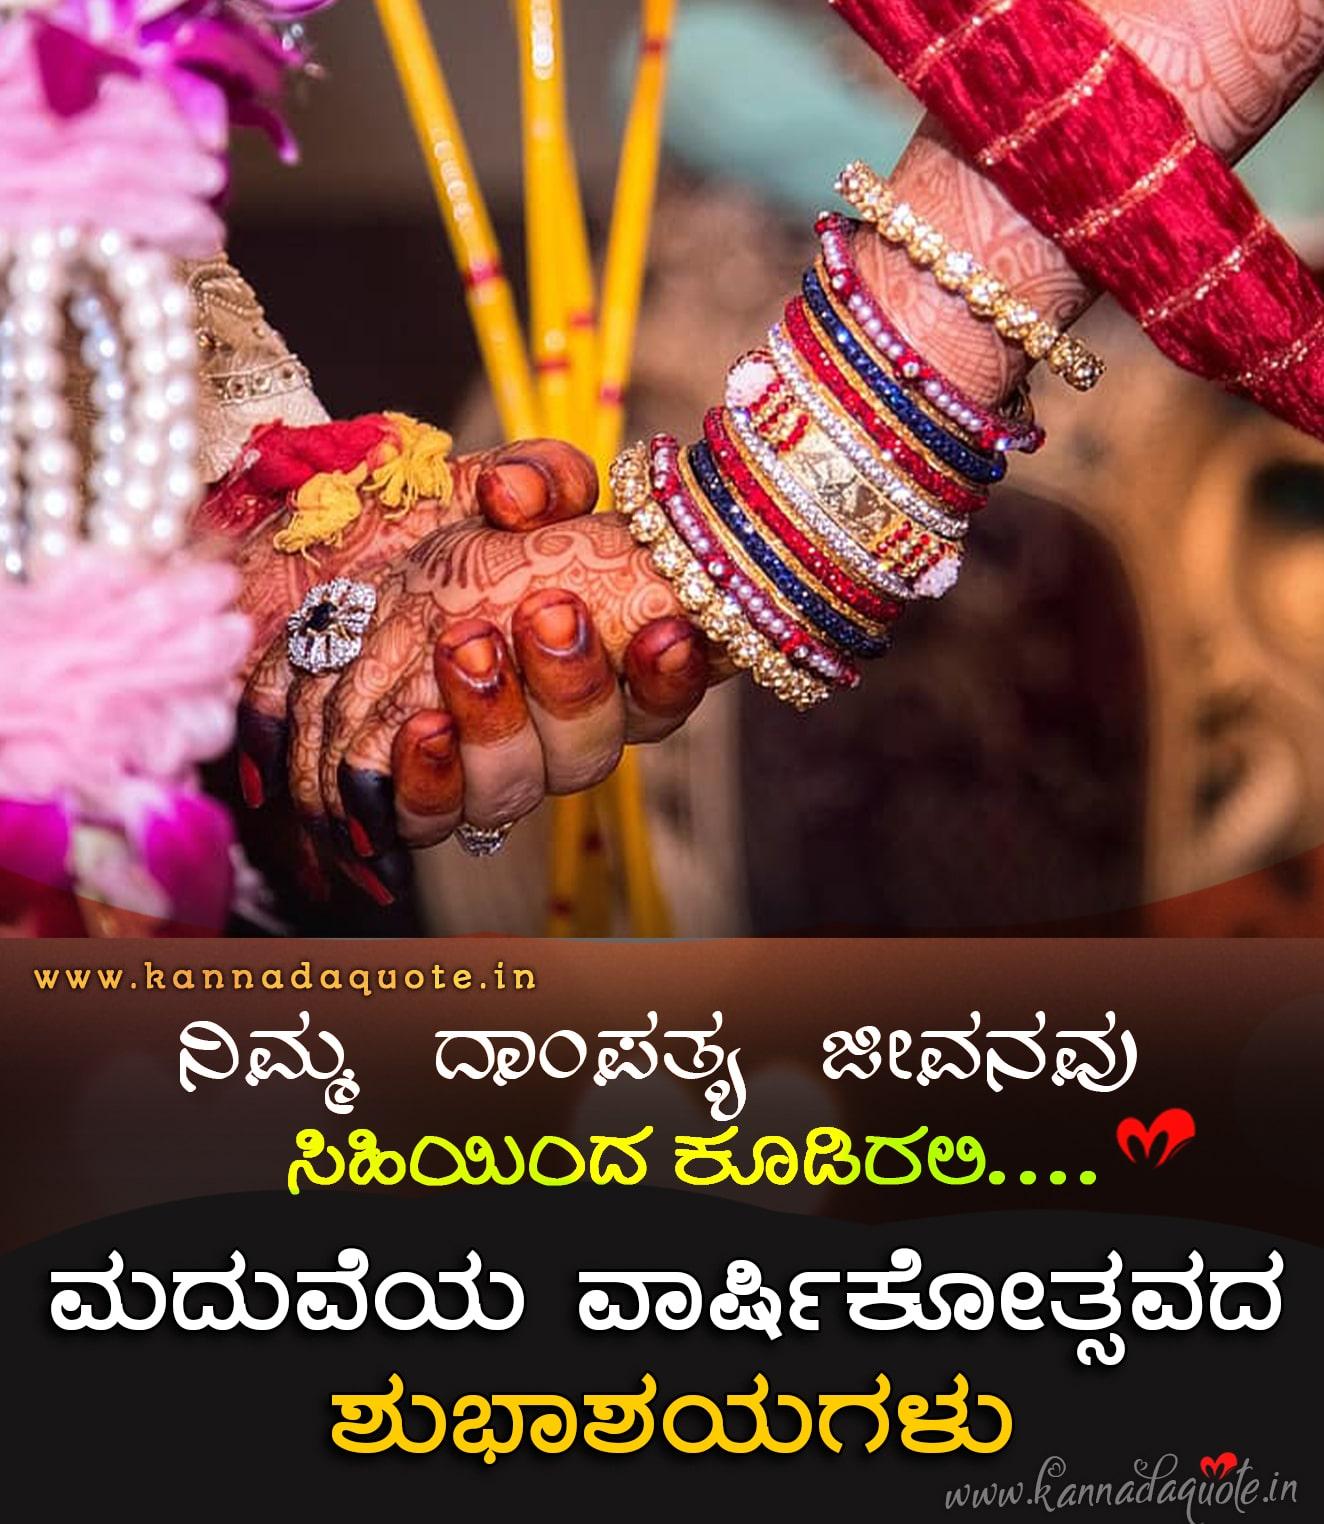 15 Happy Wedding Anniversary Wishes In Kannada